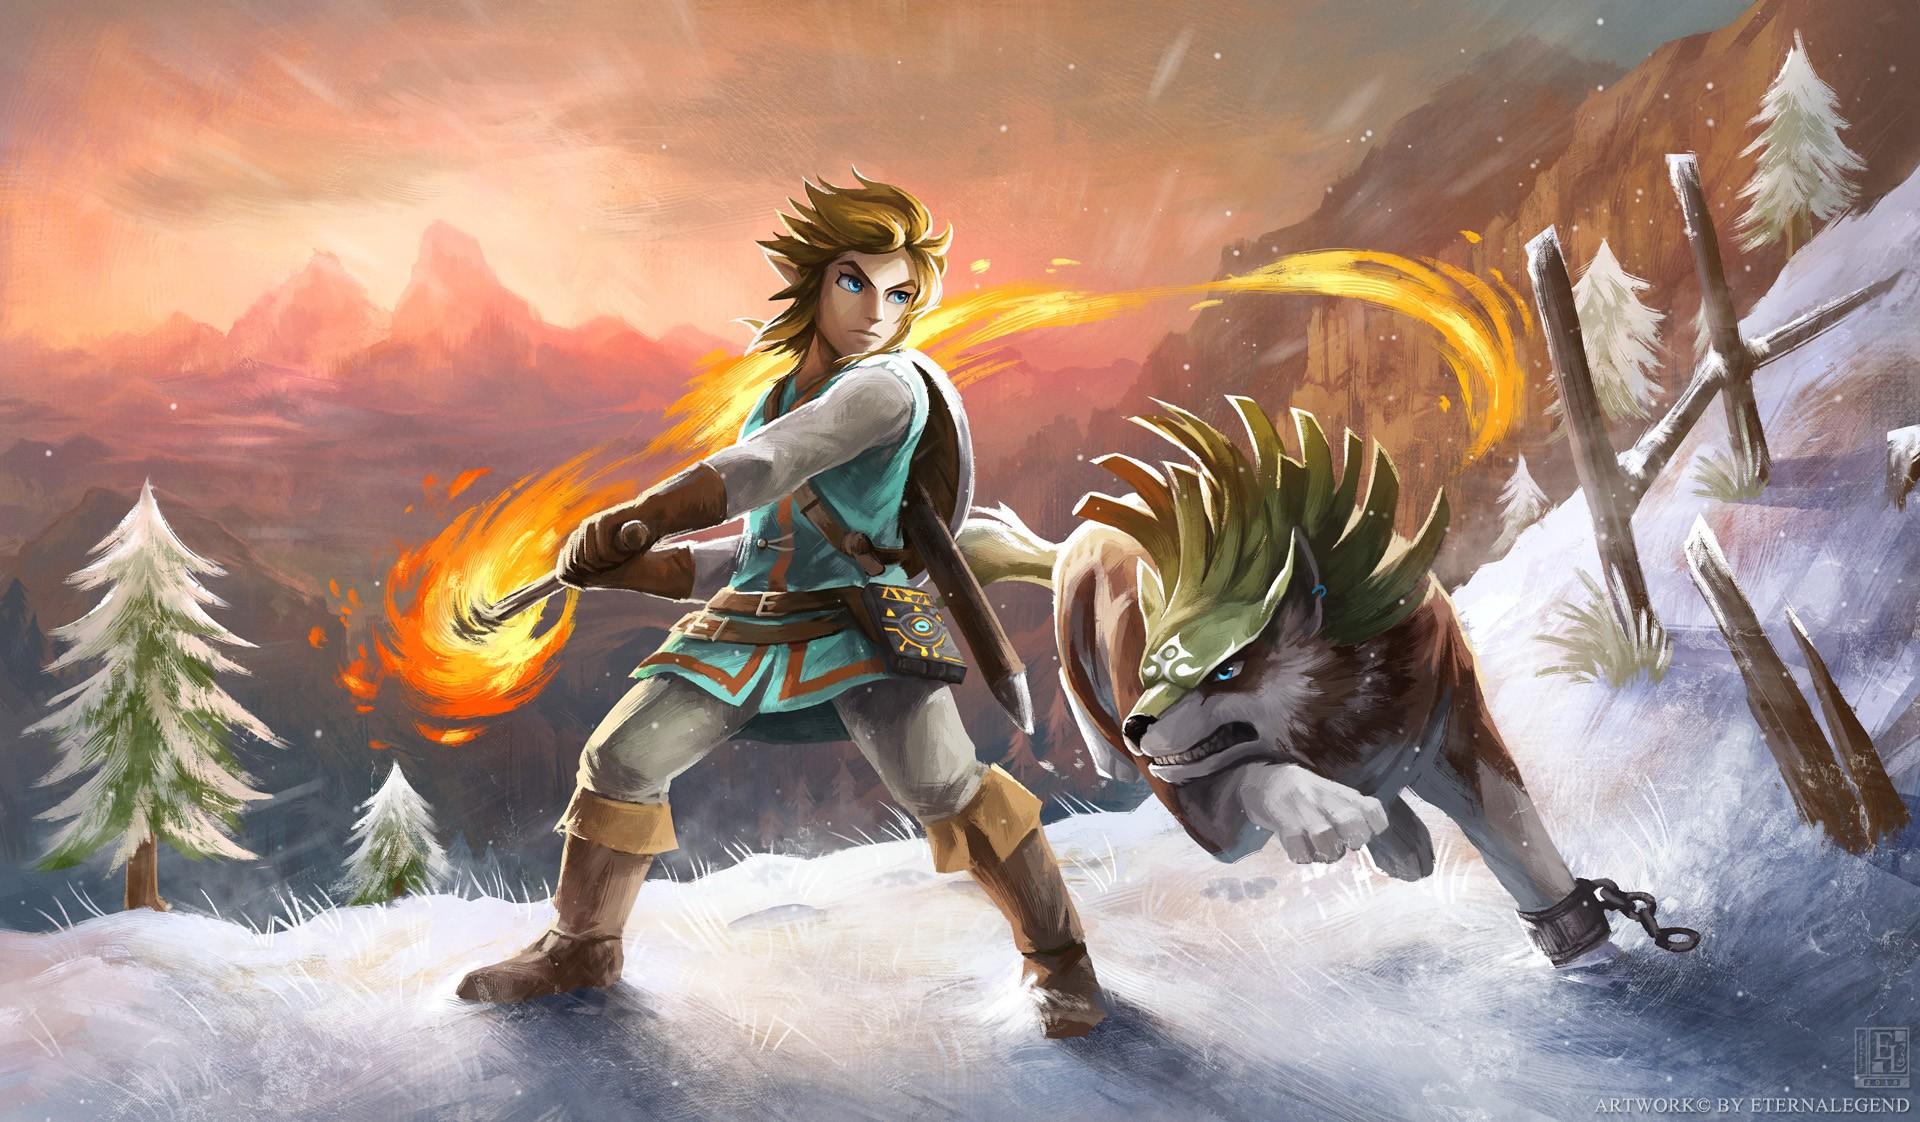 Wallpaper Anime The Legend Of Zelda Breath Of The Wild Nintendo